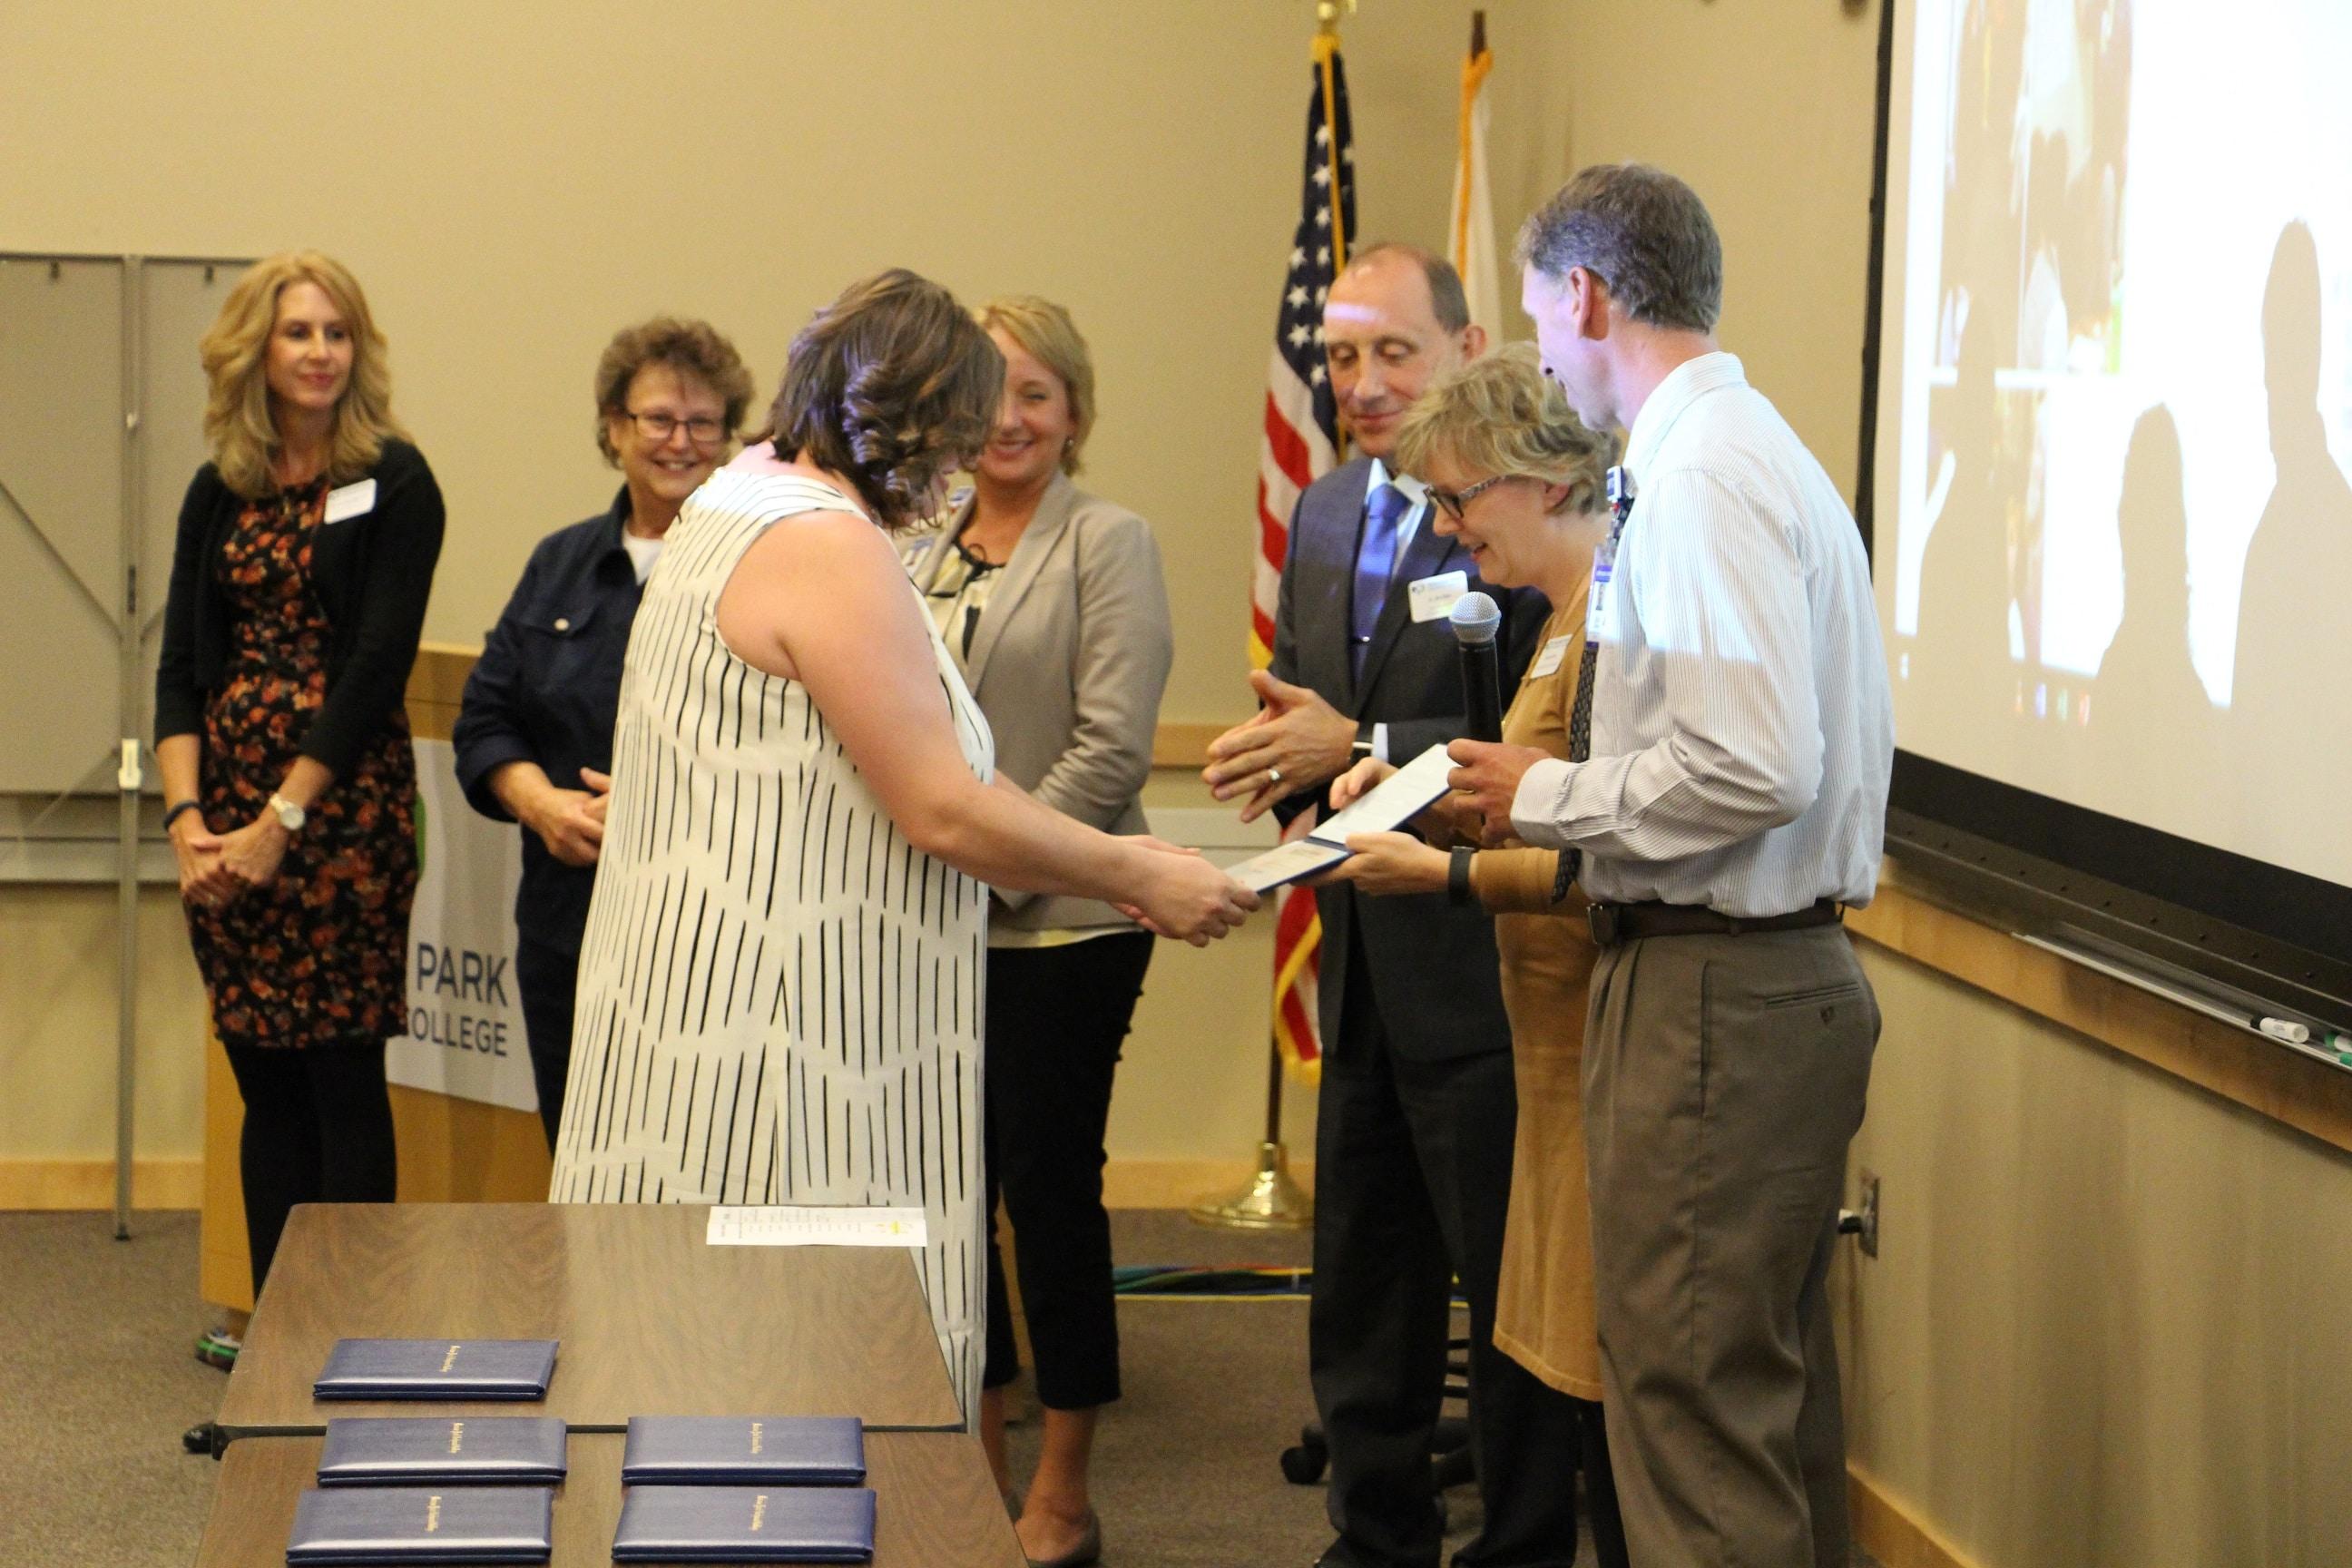 MA graduates receive diplomas